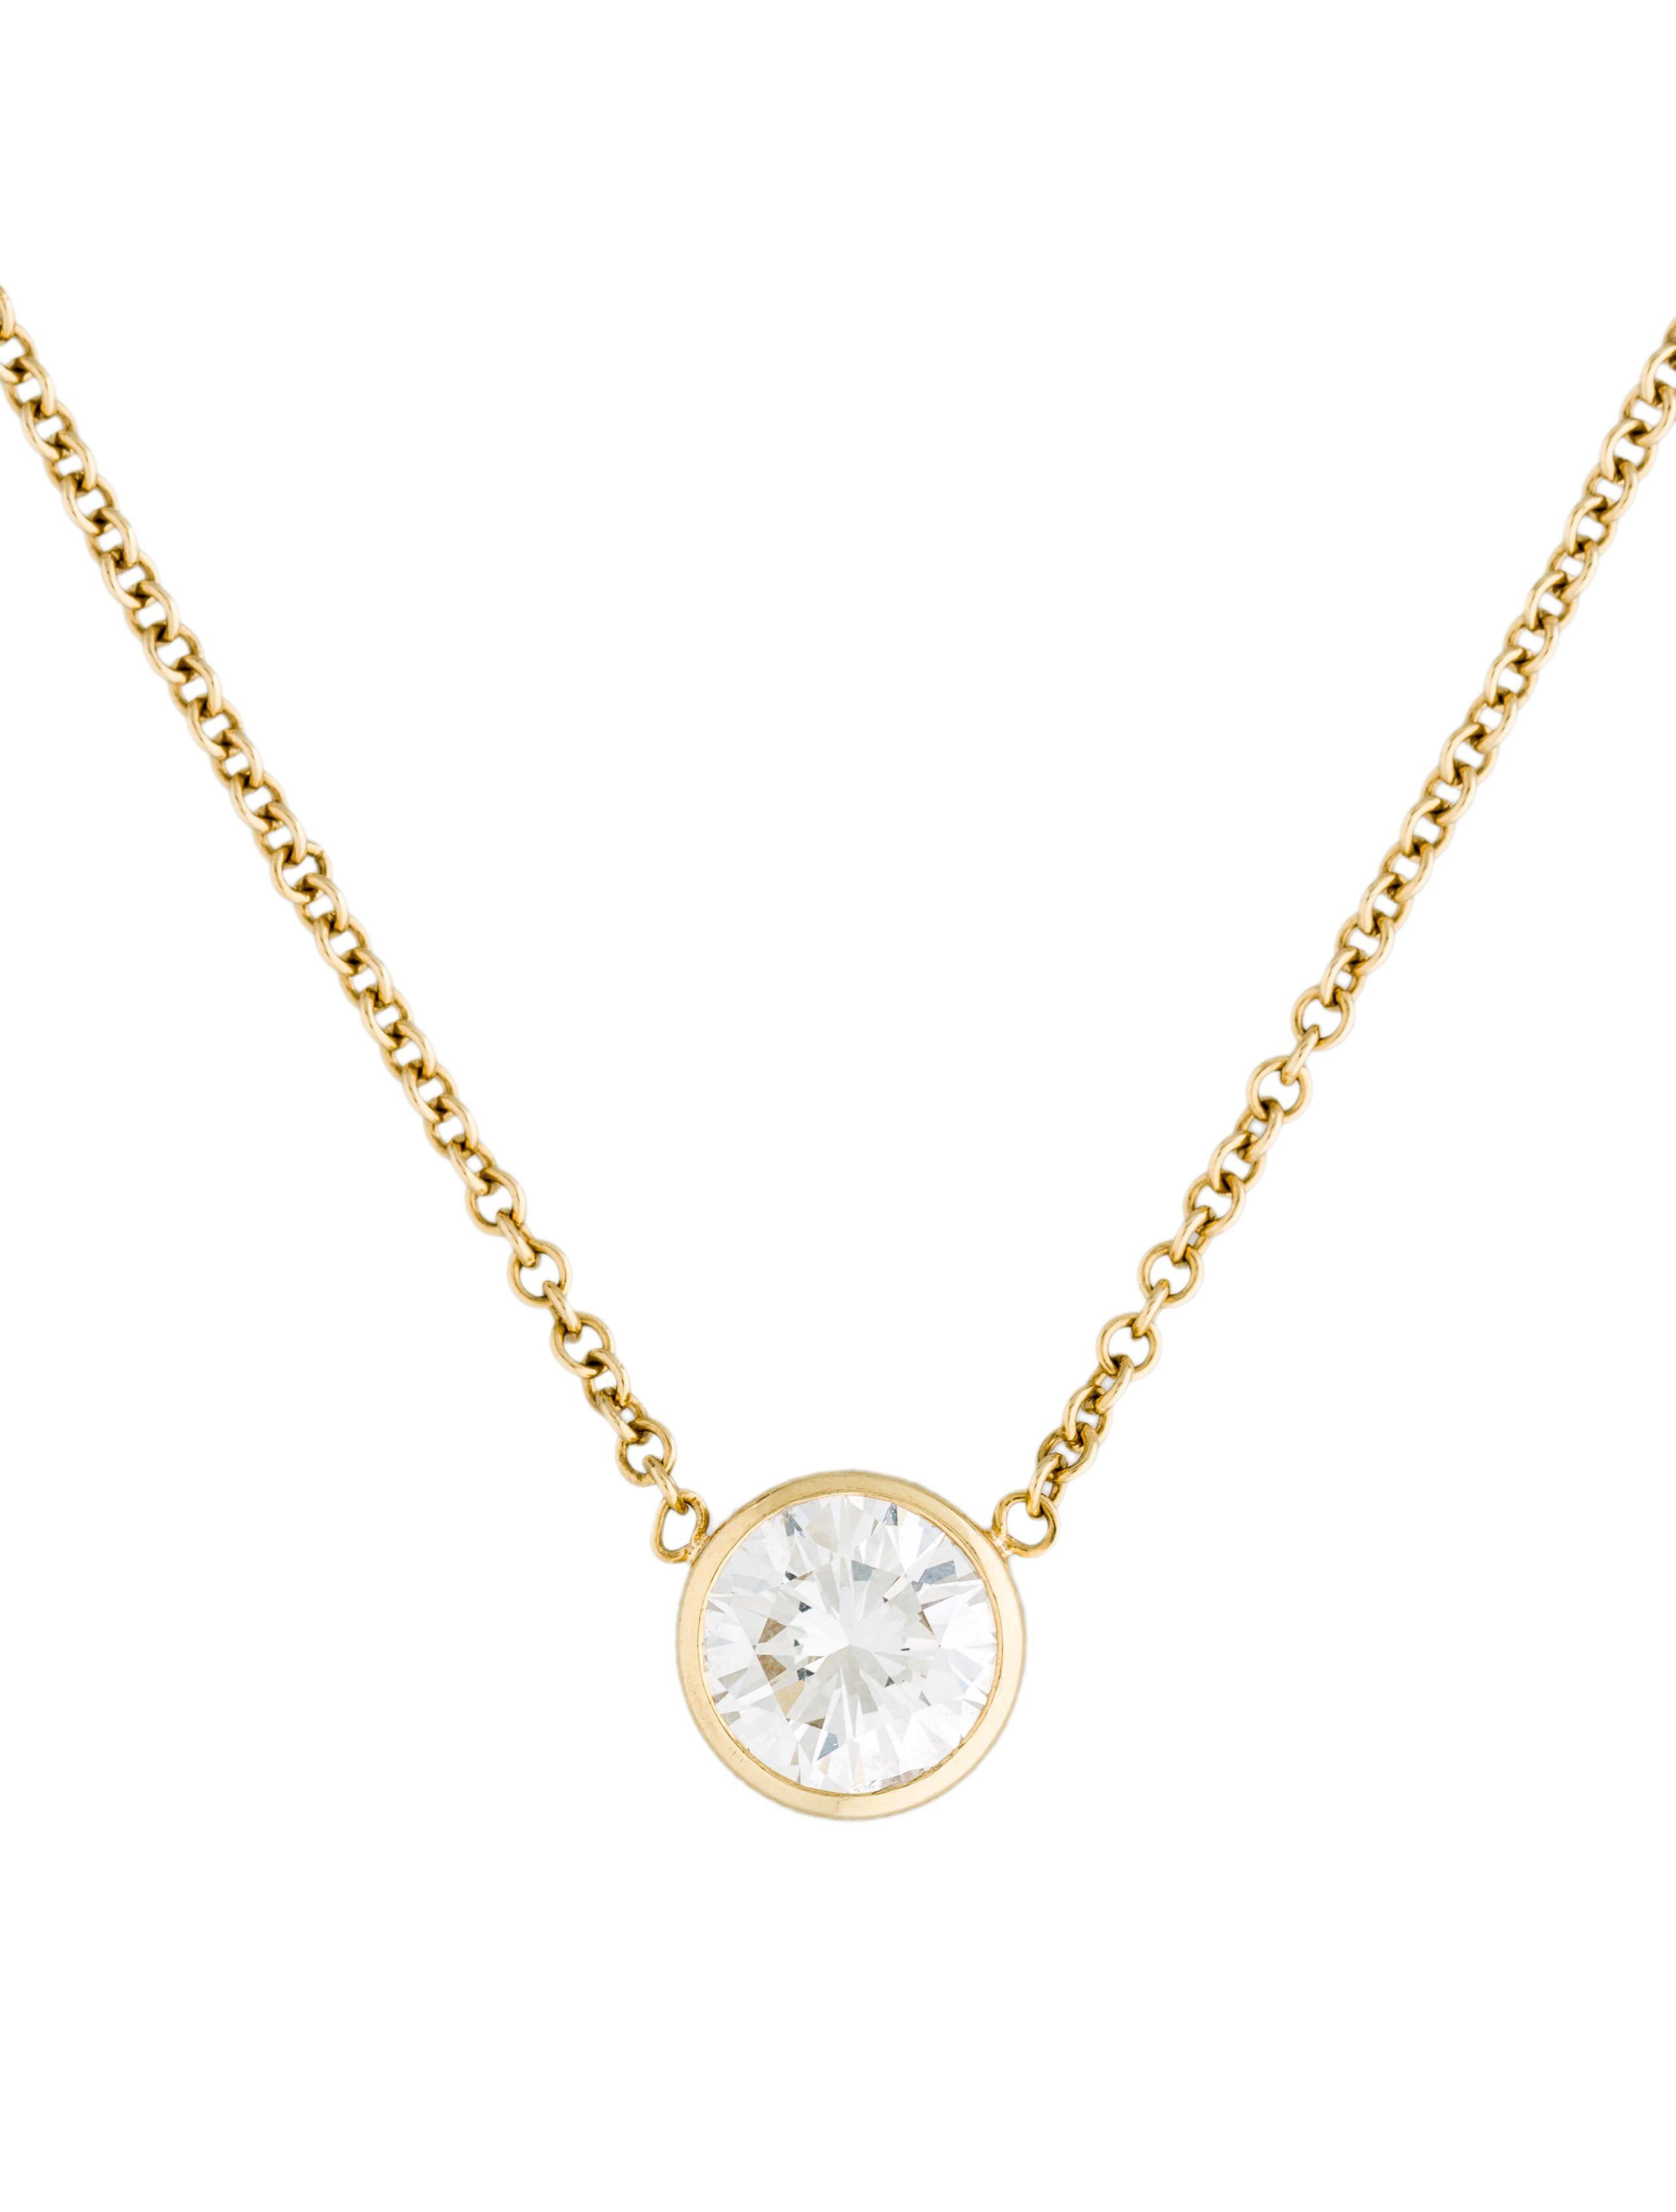 idea for mom's diamond